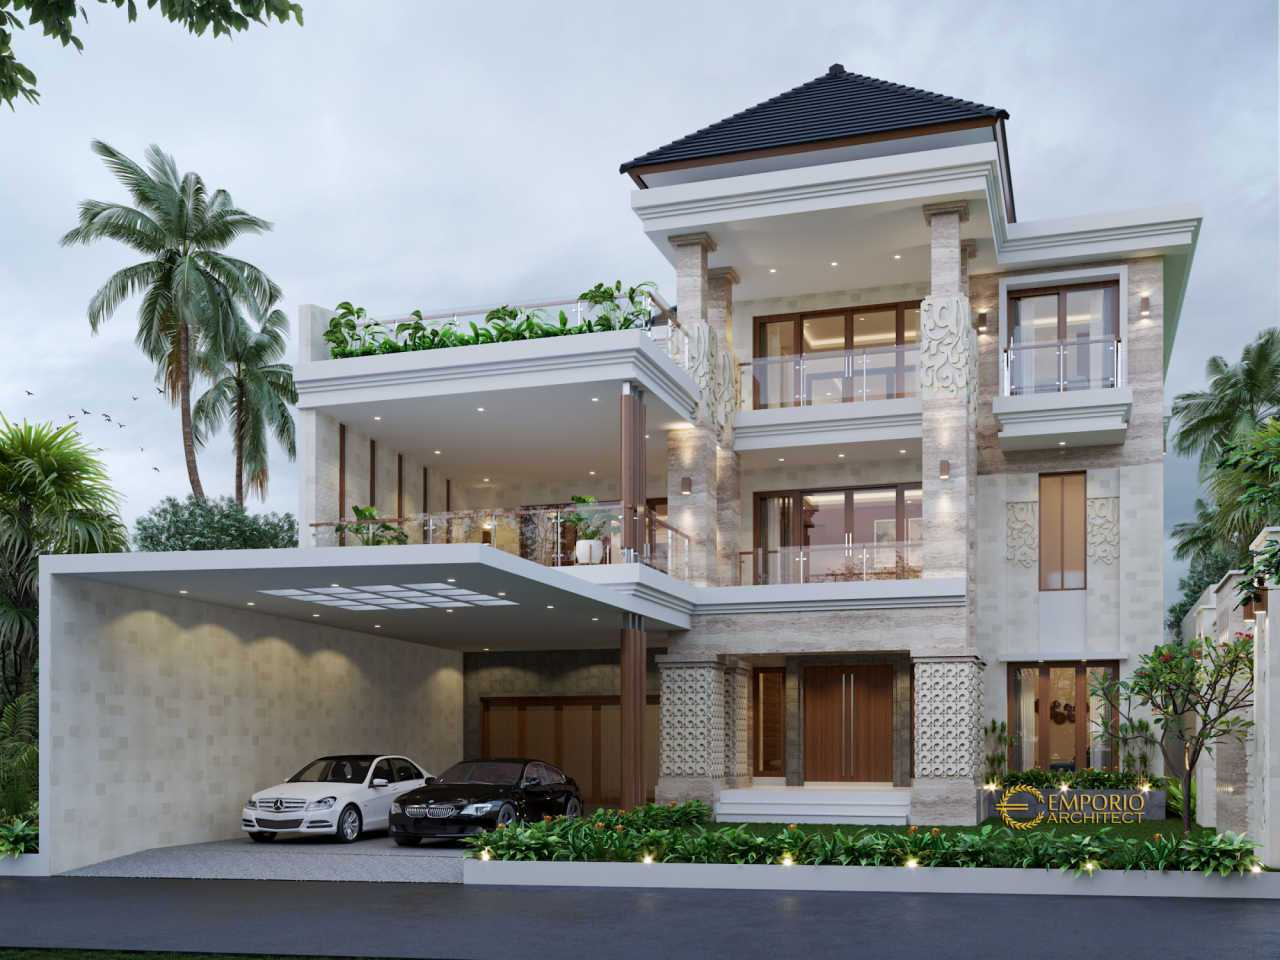 Emporio Architect Jasa Arsitek Makassar Desain Rumah Villa Bali 3 Lantai 679 @ Makassar Makassar, Kota Makassar, Sulawesi Selatan, Indonesia Makassar, Kota Makassar, Sulawesi Selatan, Indonesia Emporio-Architect-Jasa-Arsitek-Makassar-Desain-Rumah-Villa-Bali-3-Lantai-679-Makassar Tropical 89527